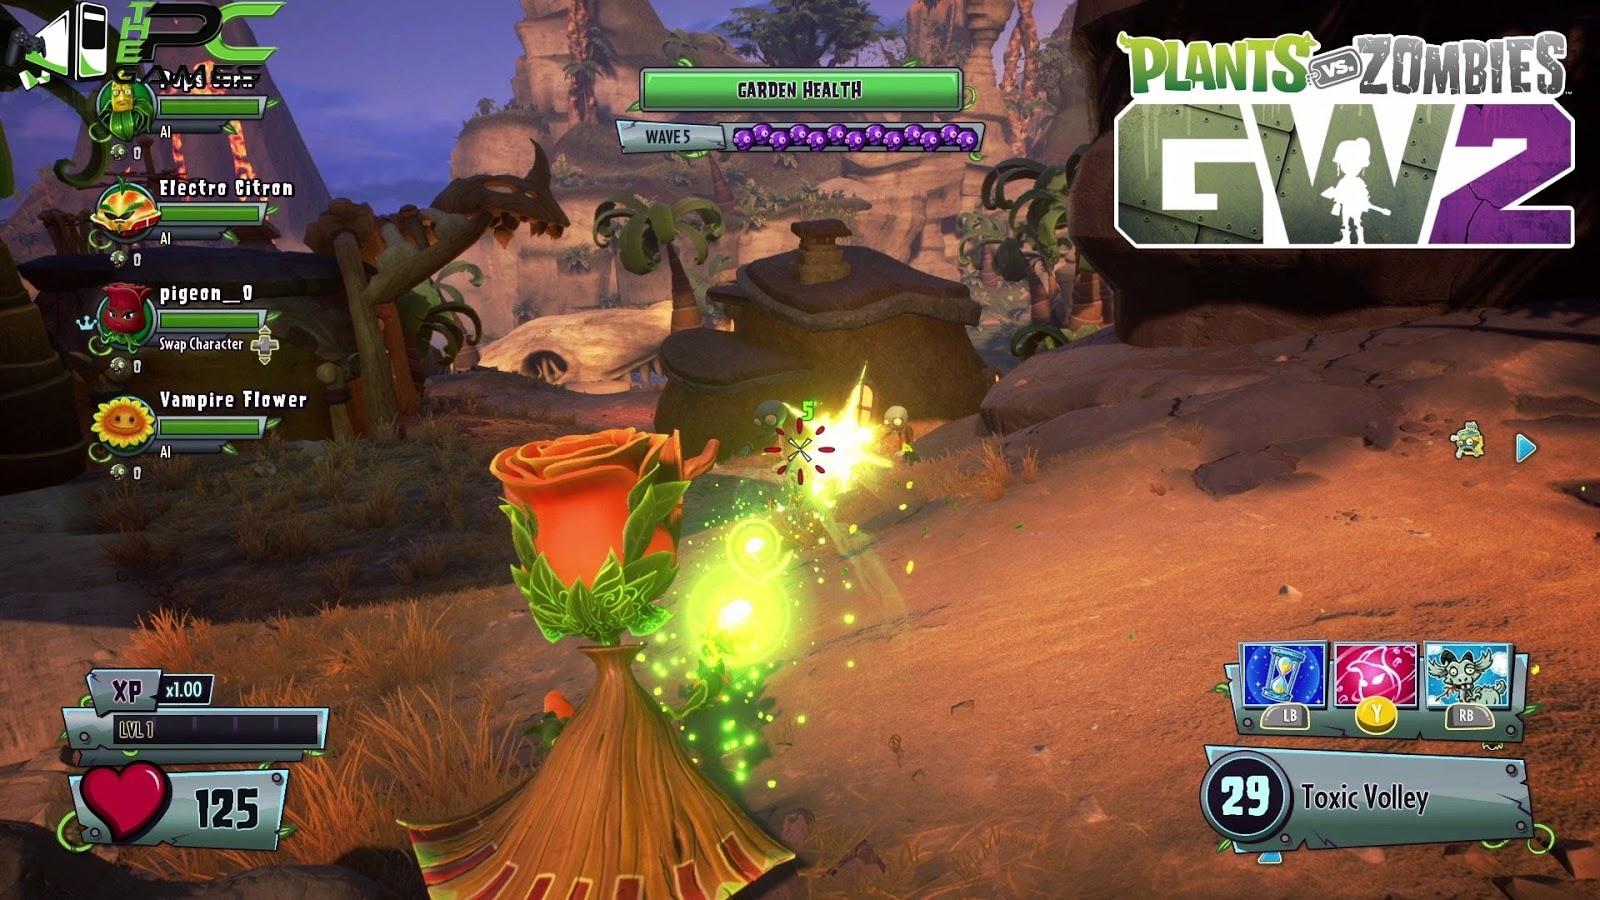 Gen Way Plants Vs Zombies Garden Warfare 2 Pc Game Free Download